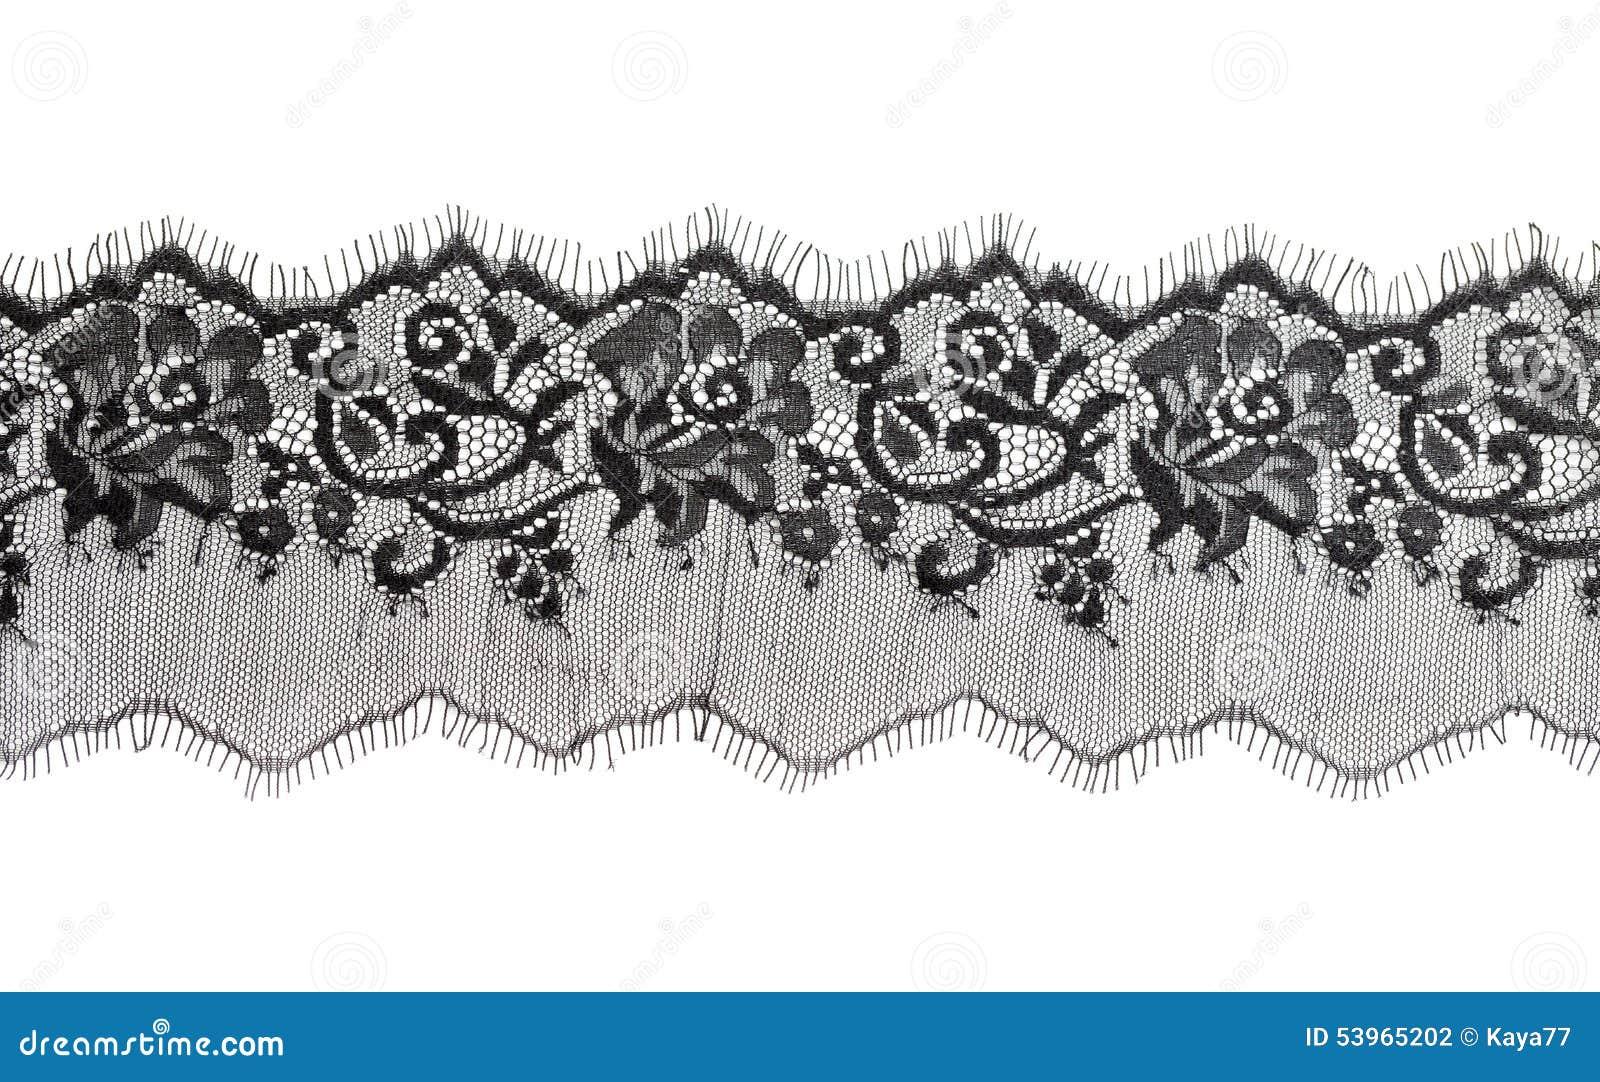 Blumenbeschaffenheit der schwarzen feinen Spitzes